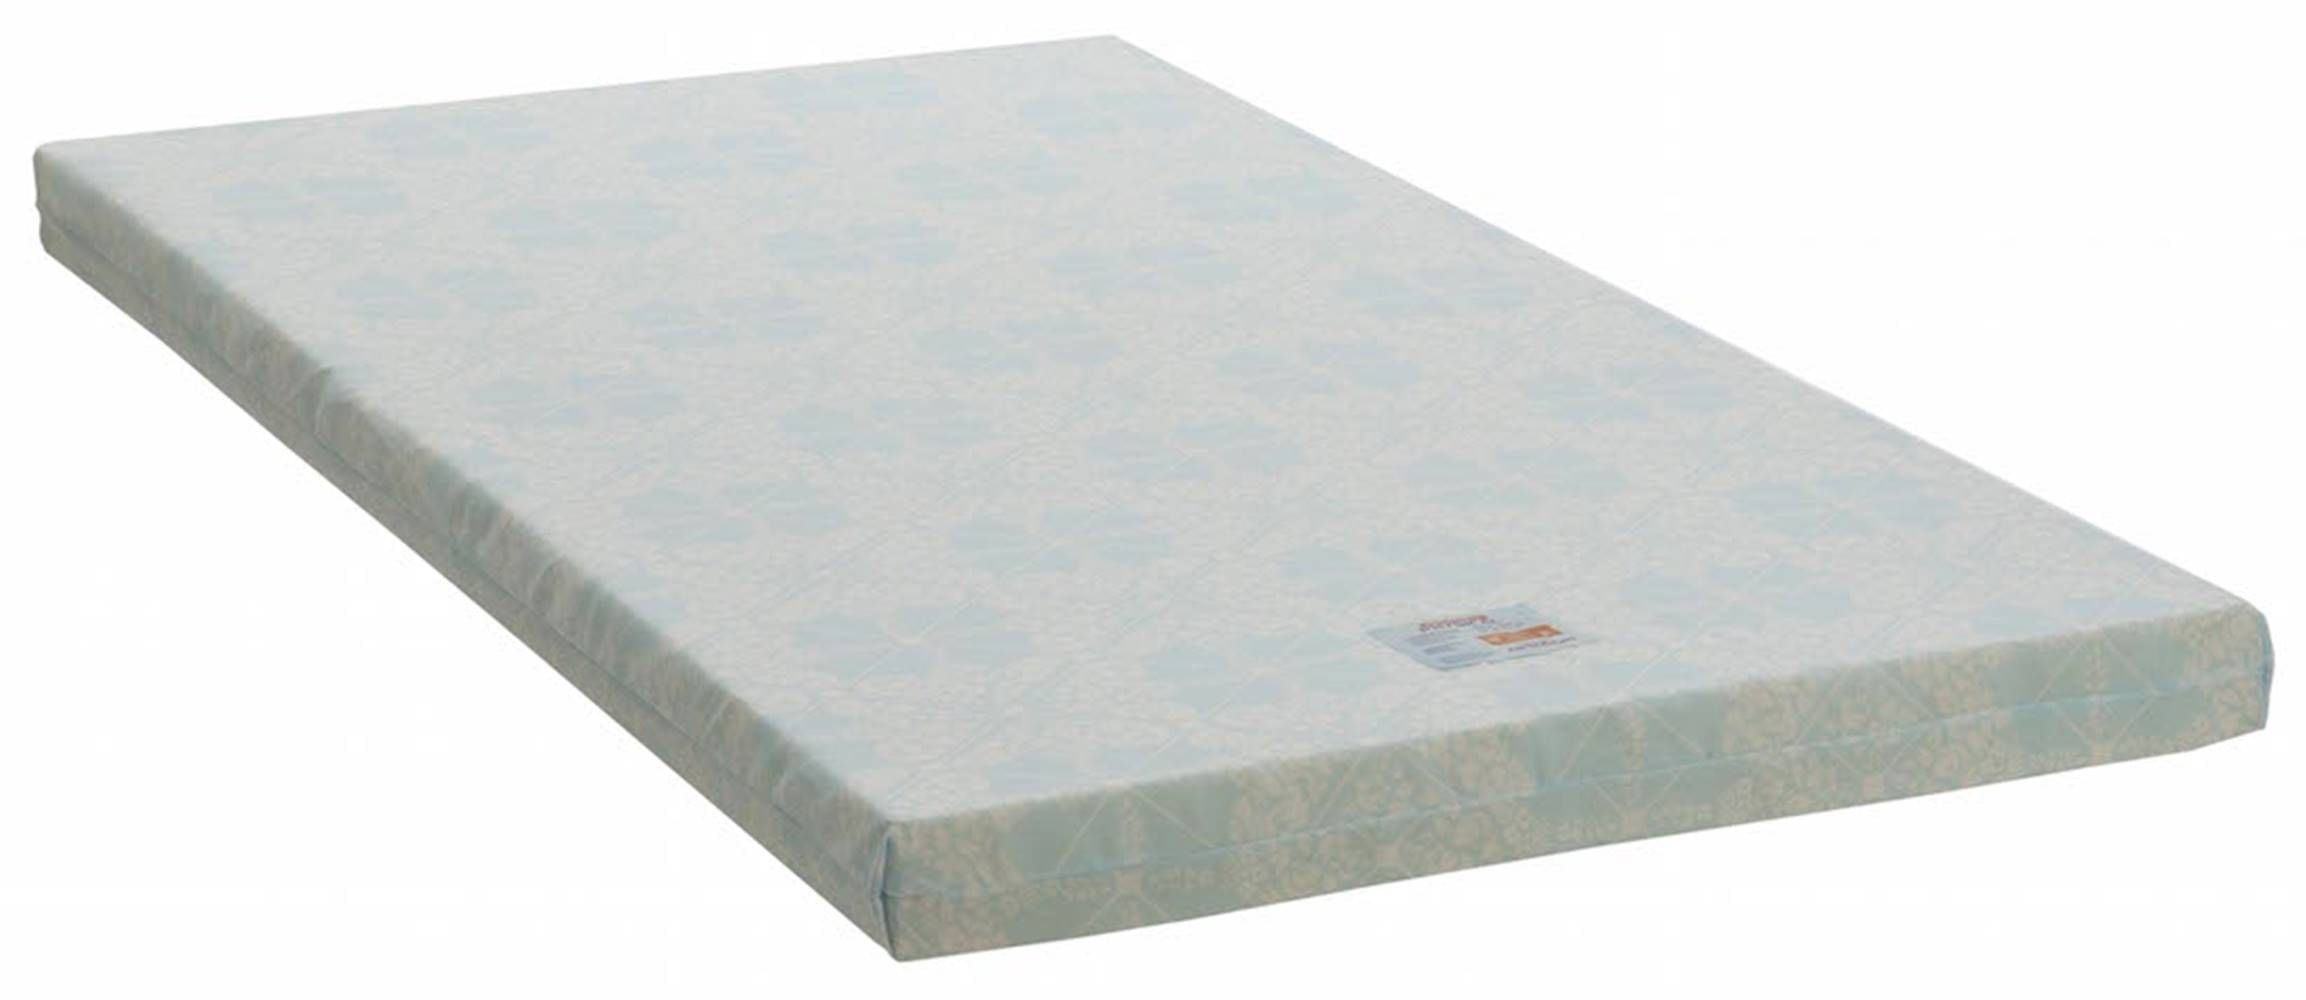 Colchonete Physical Alto Solteiro 88 cm (LARG) Branco e Azul - 42954